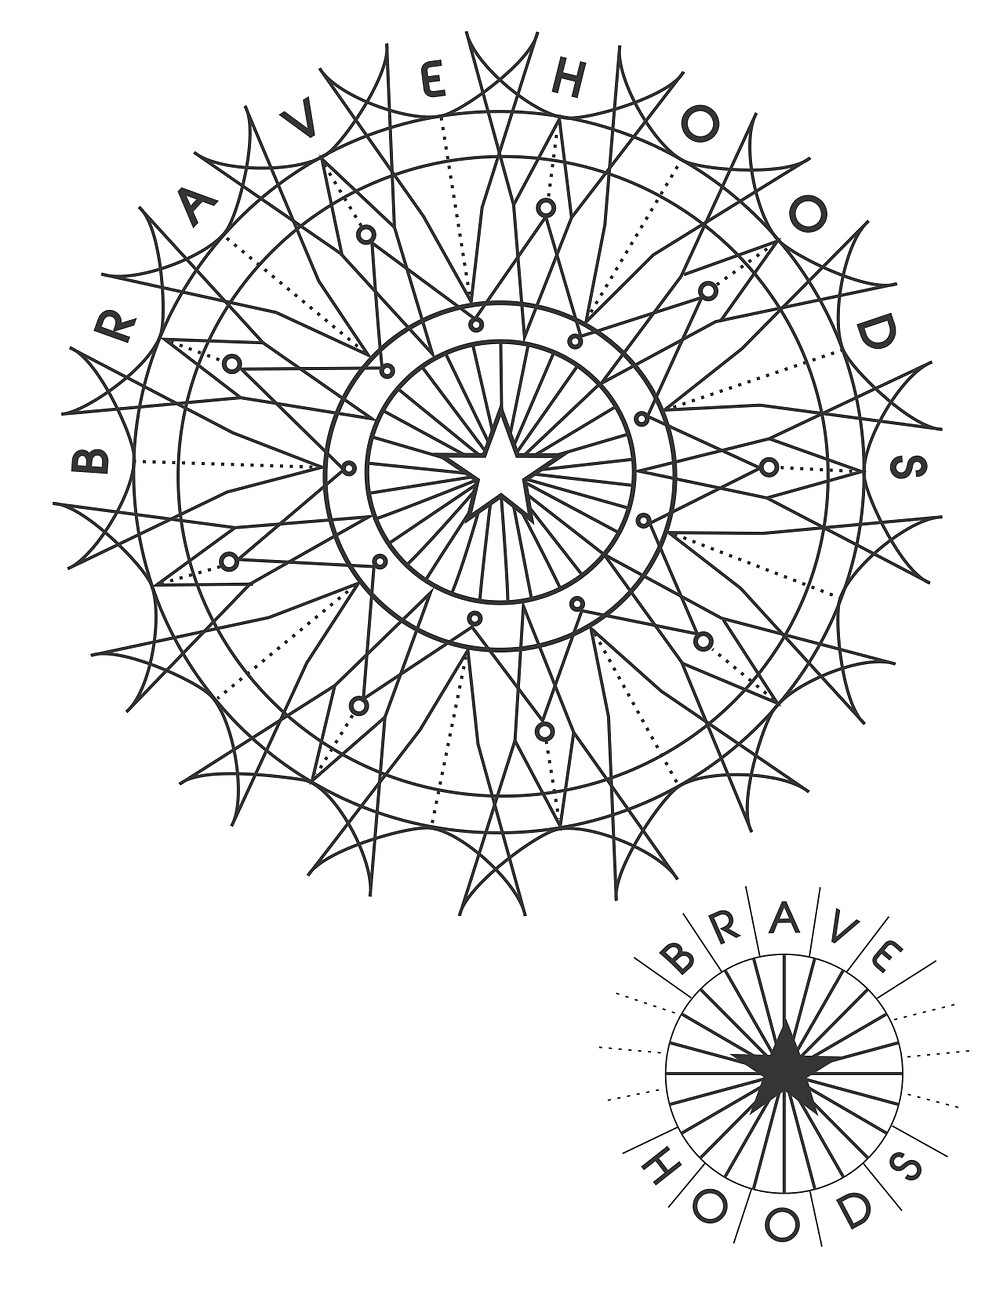 Bravehoods spiral lined copy.jpg